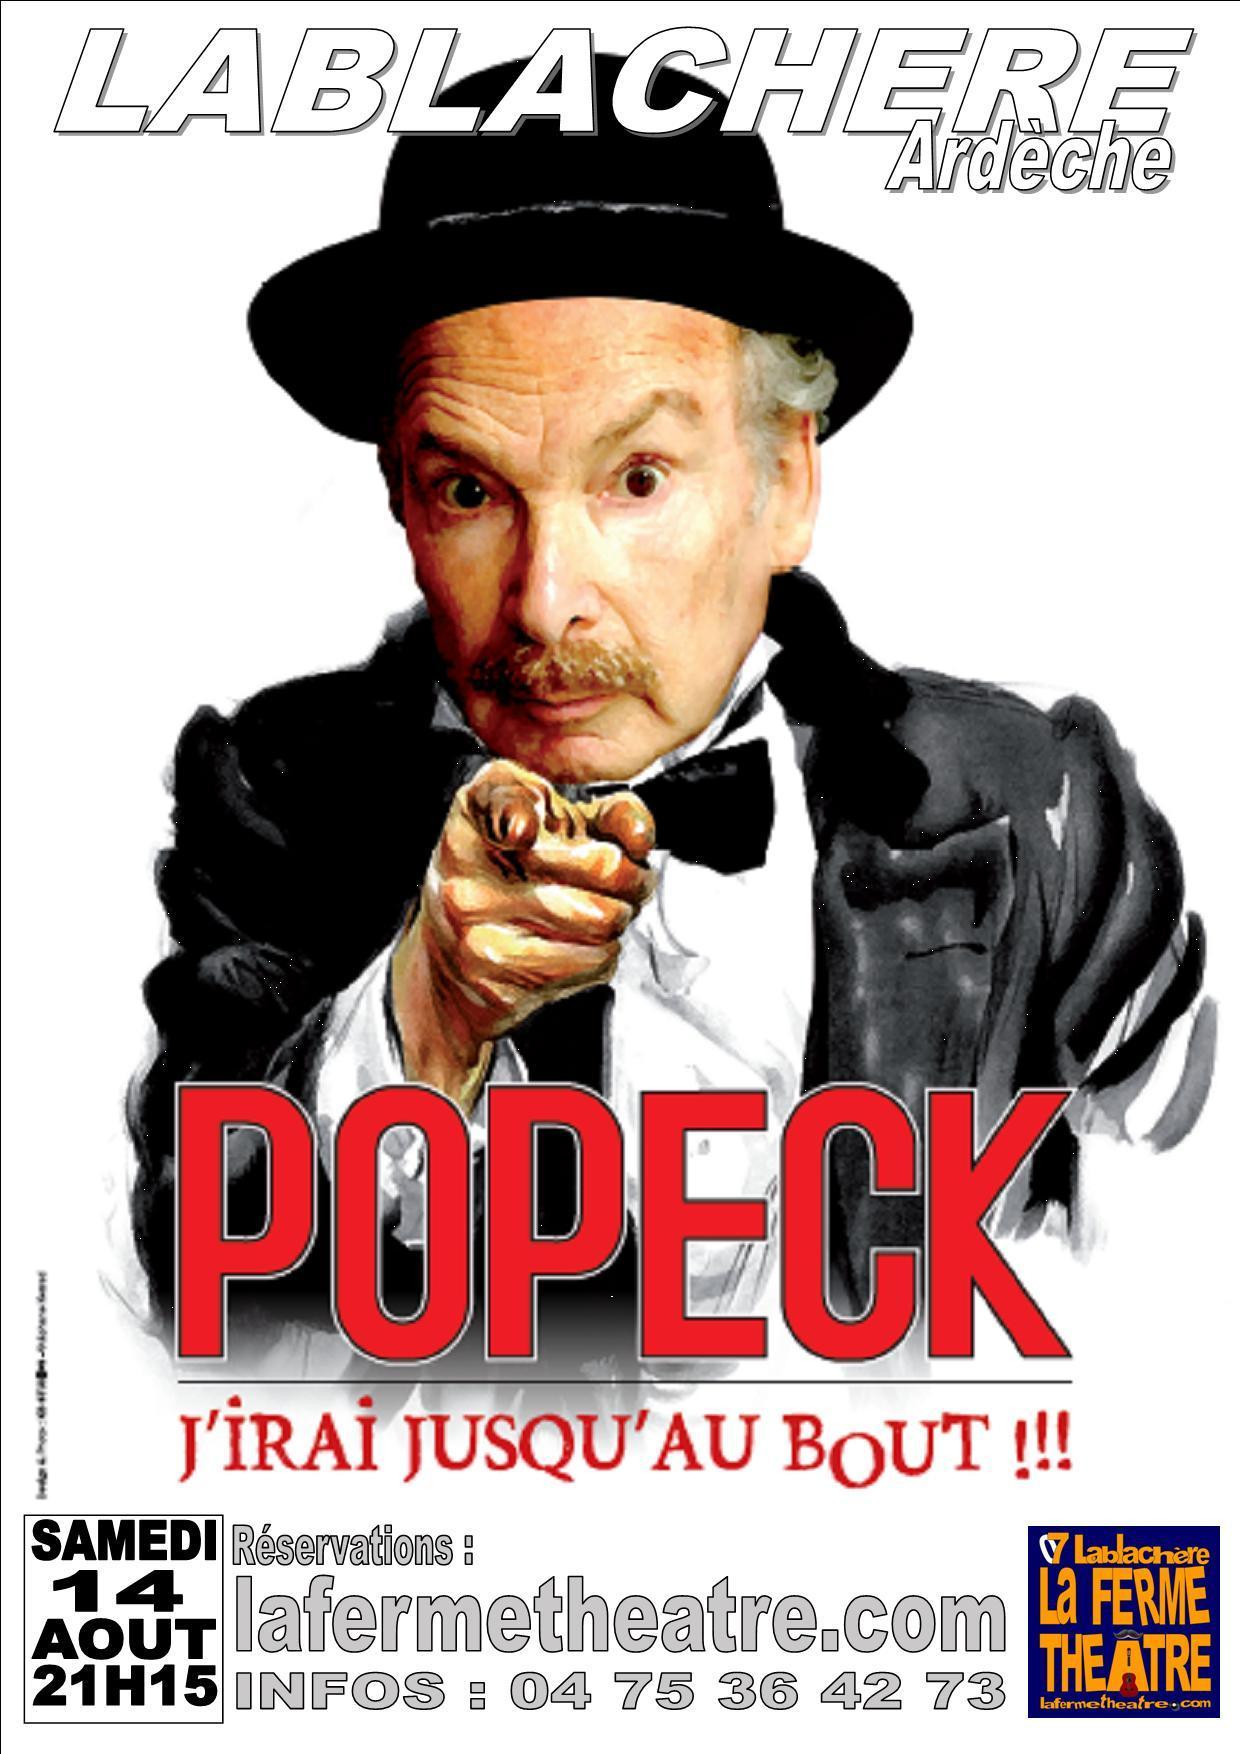 20210814 popeck